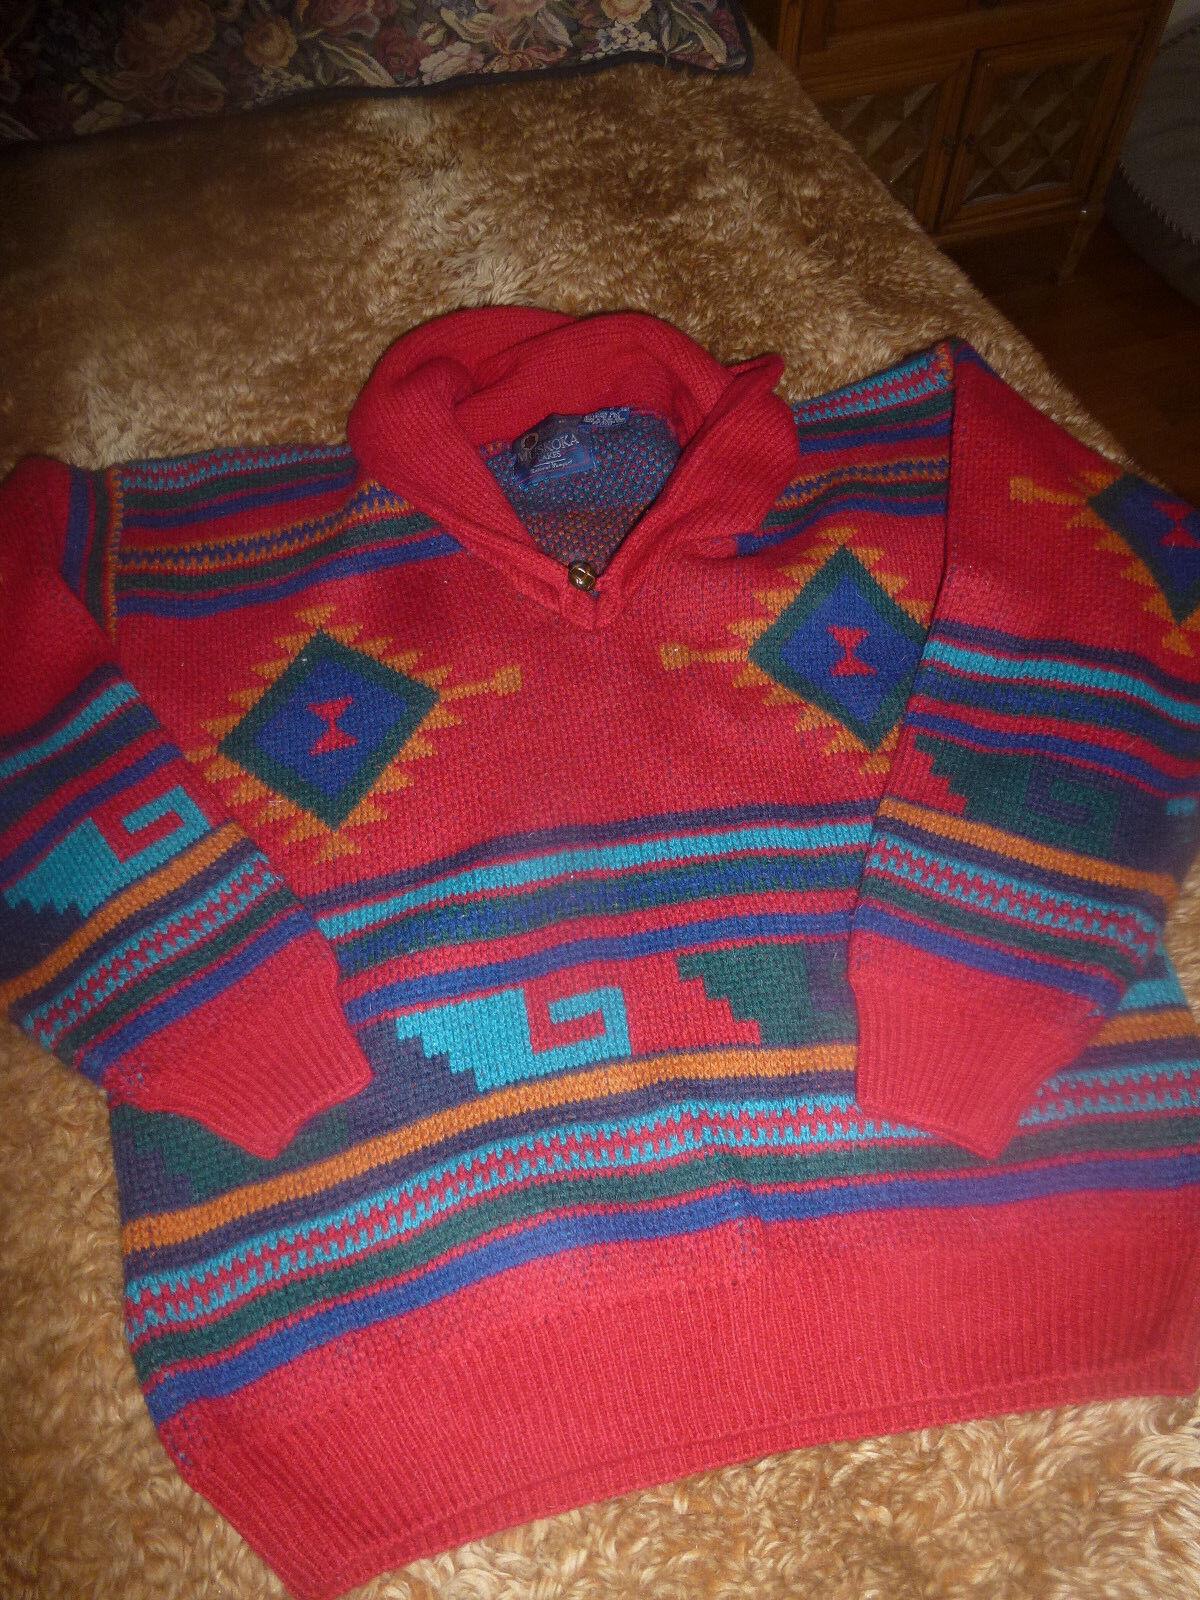 Men's MUSKOKA-LAKES 100 % Shetland Wool Sweater Southwestern Design Size L